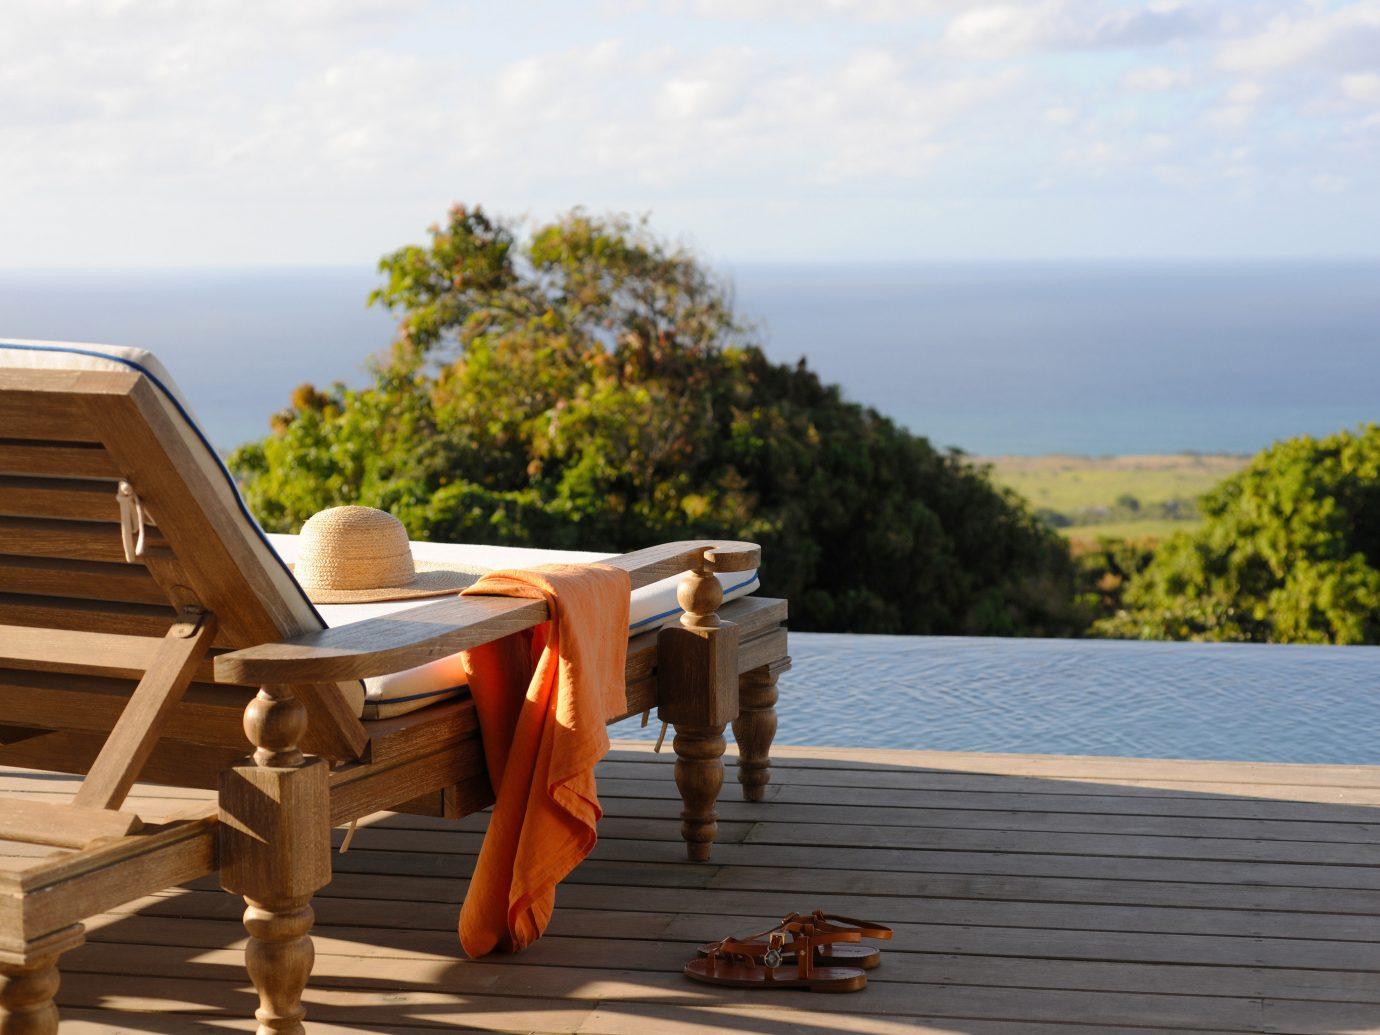 Hotels sky outdoor water leisure vacation furniture wooden wood Beach walkway overlooking seat Deck